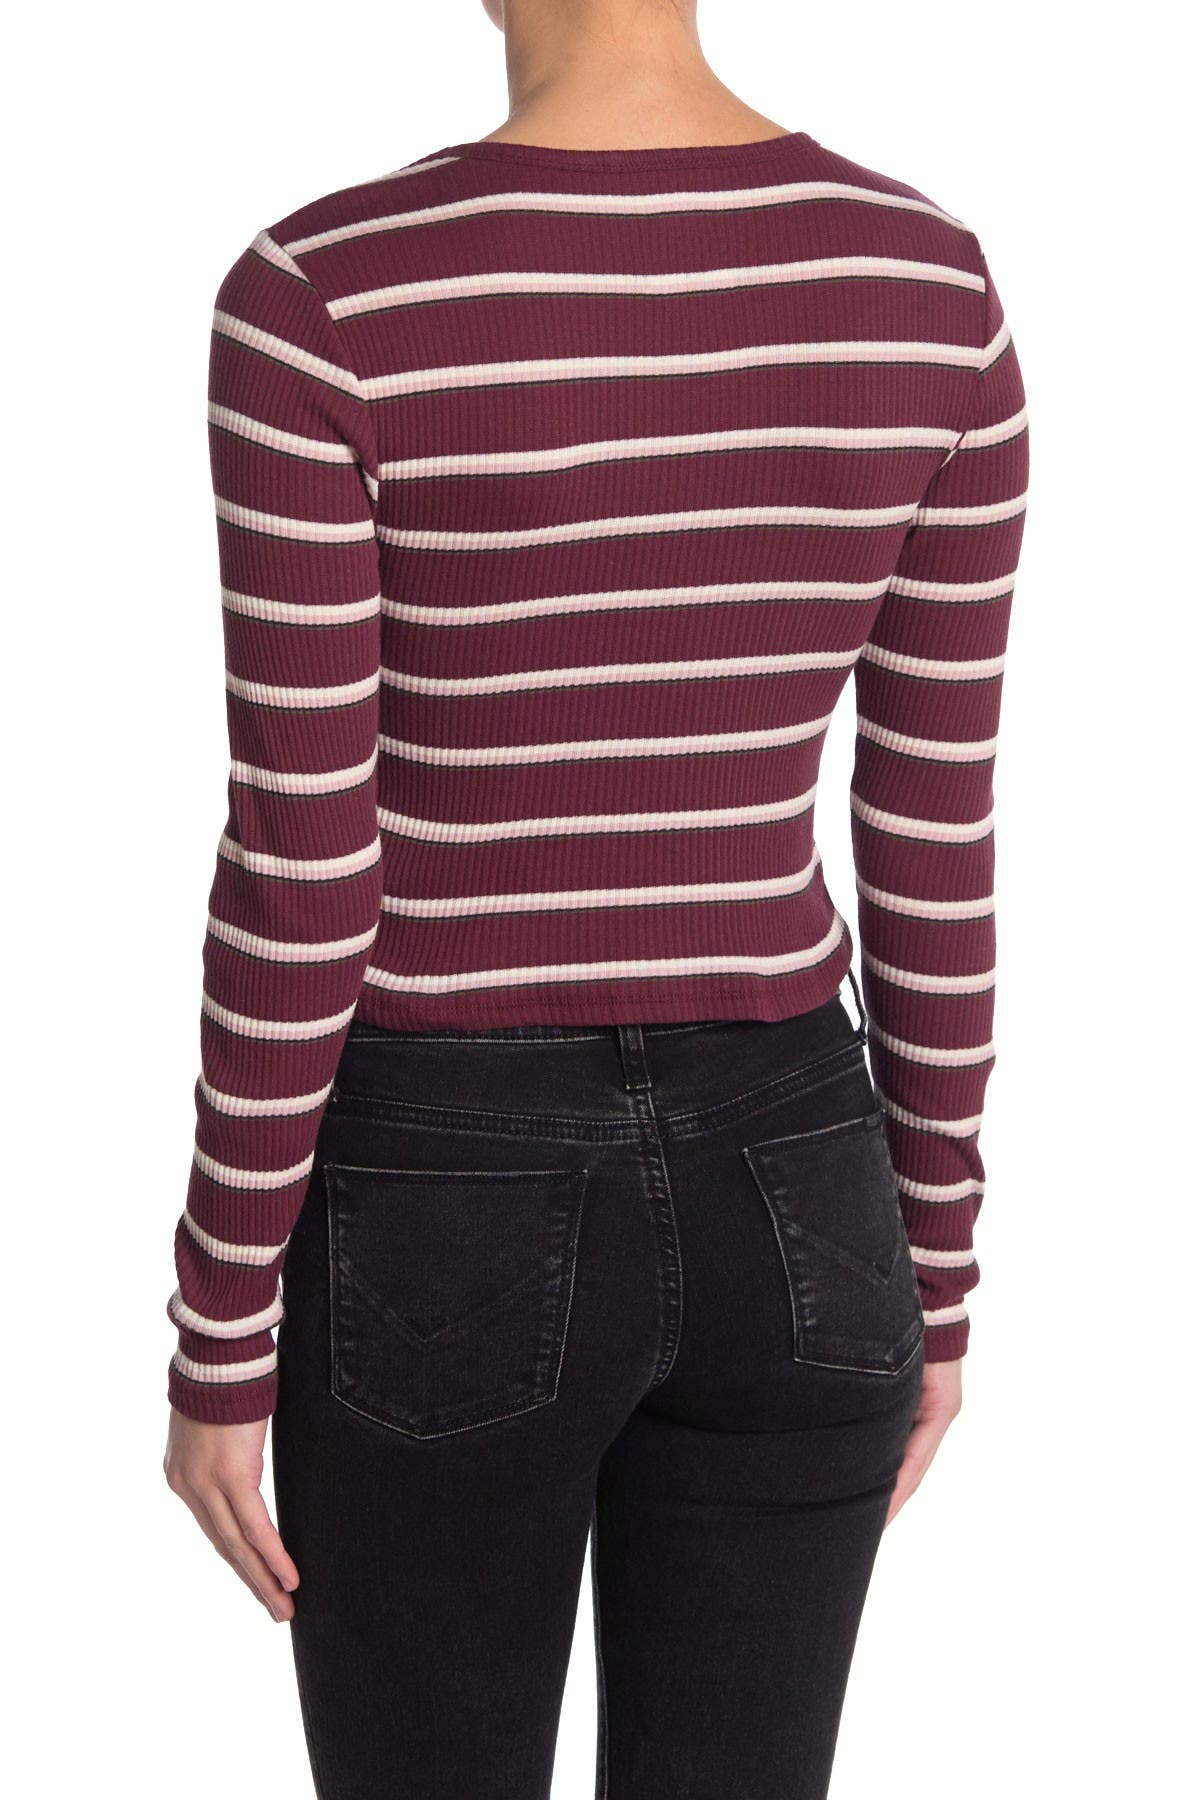 Image of Dickies Stripe Rib Knit Top